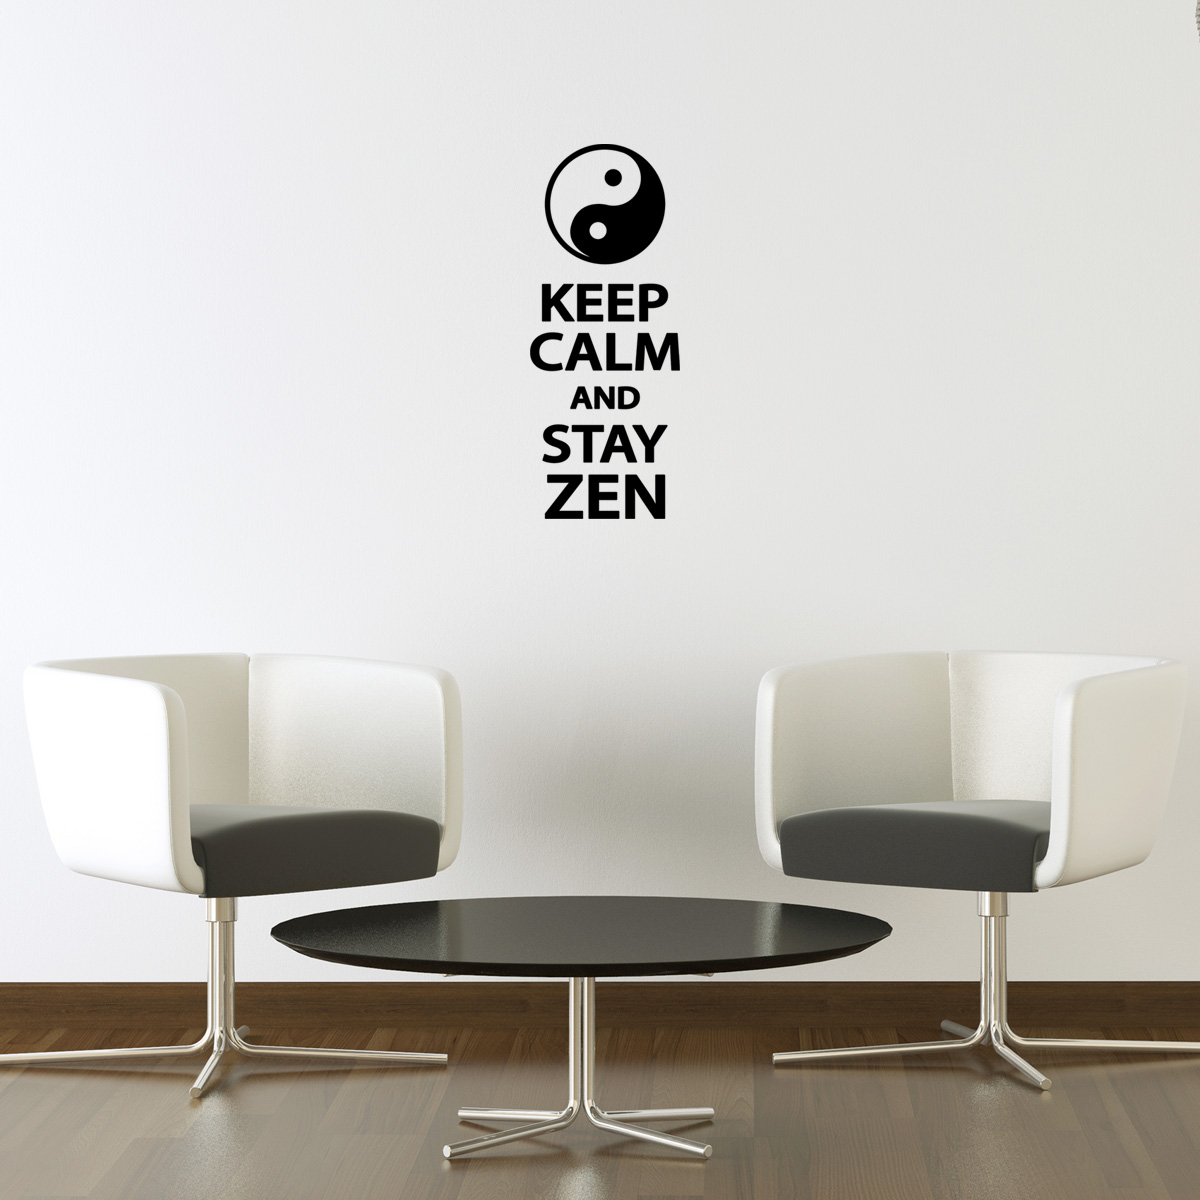 Sticker Mural Gardez Votre Calme Et